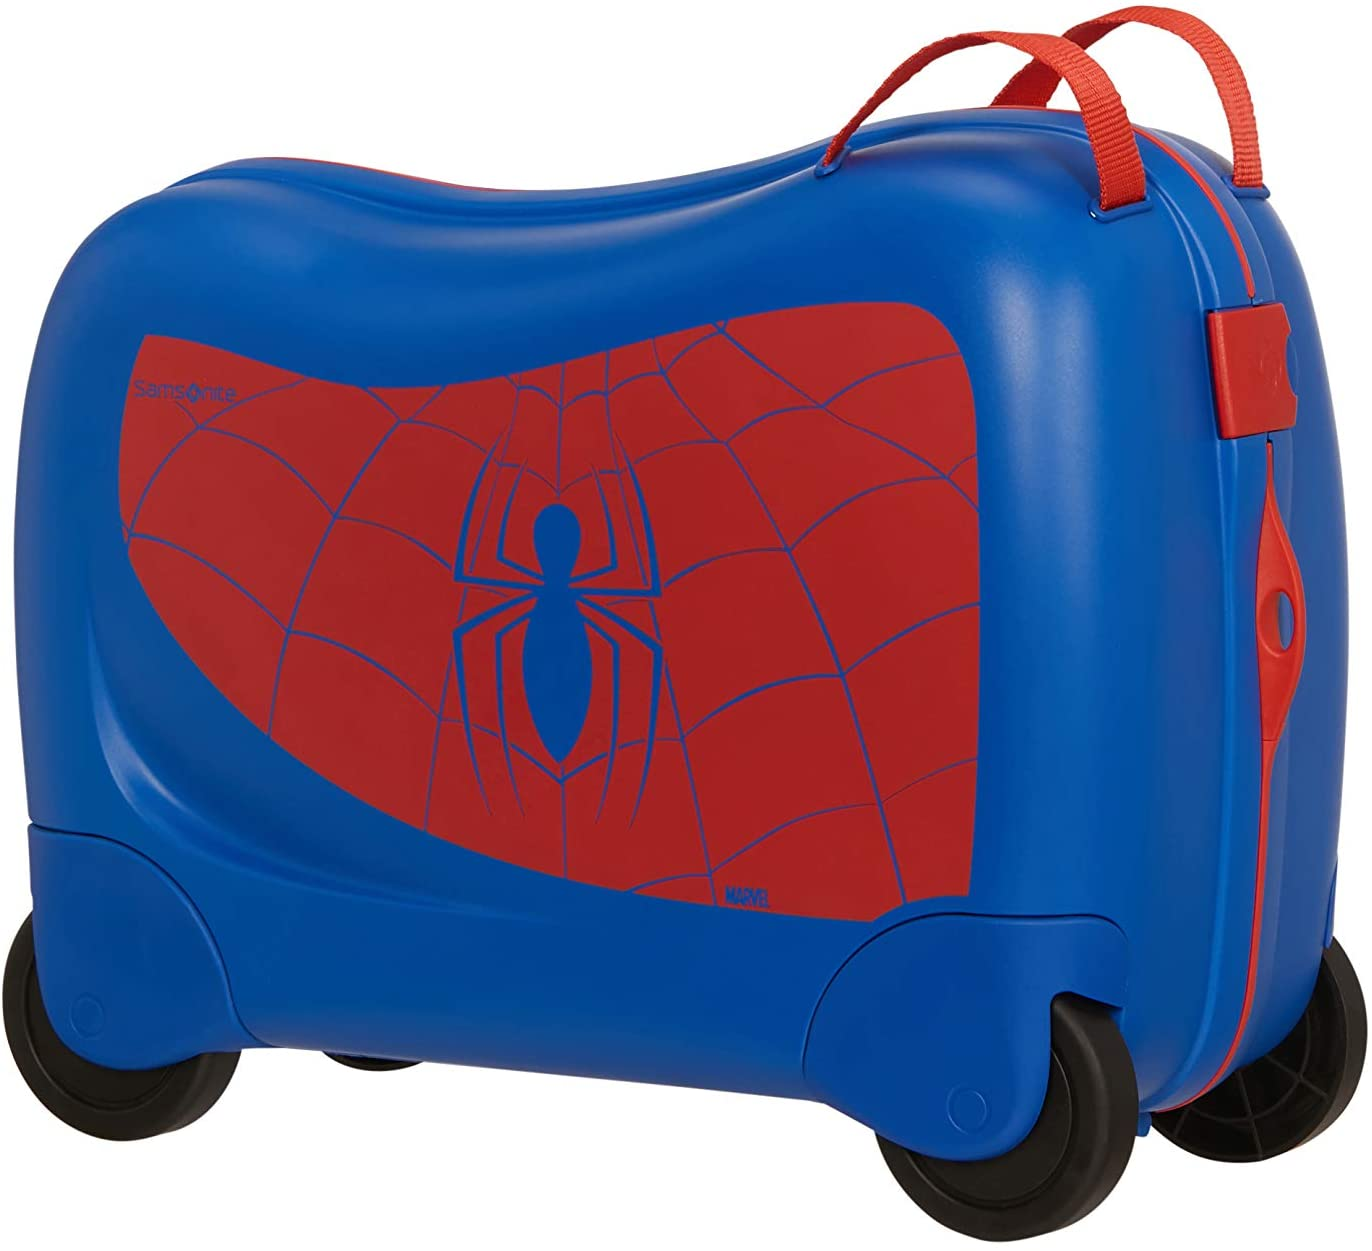 Maleta infantil con ruedas Spiderman